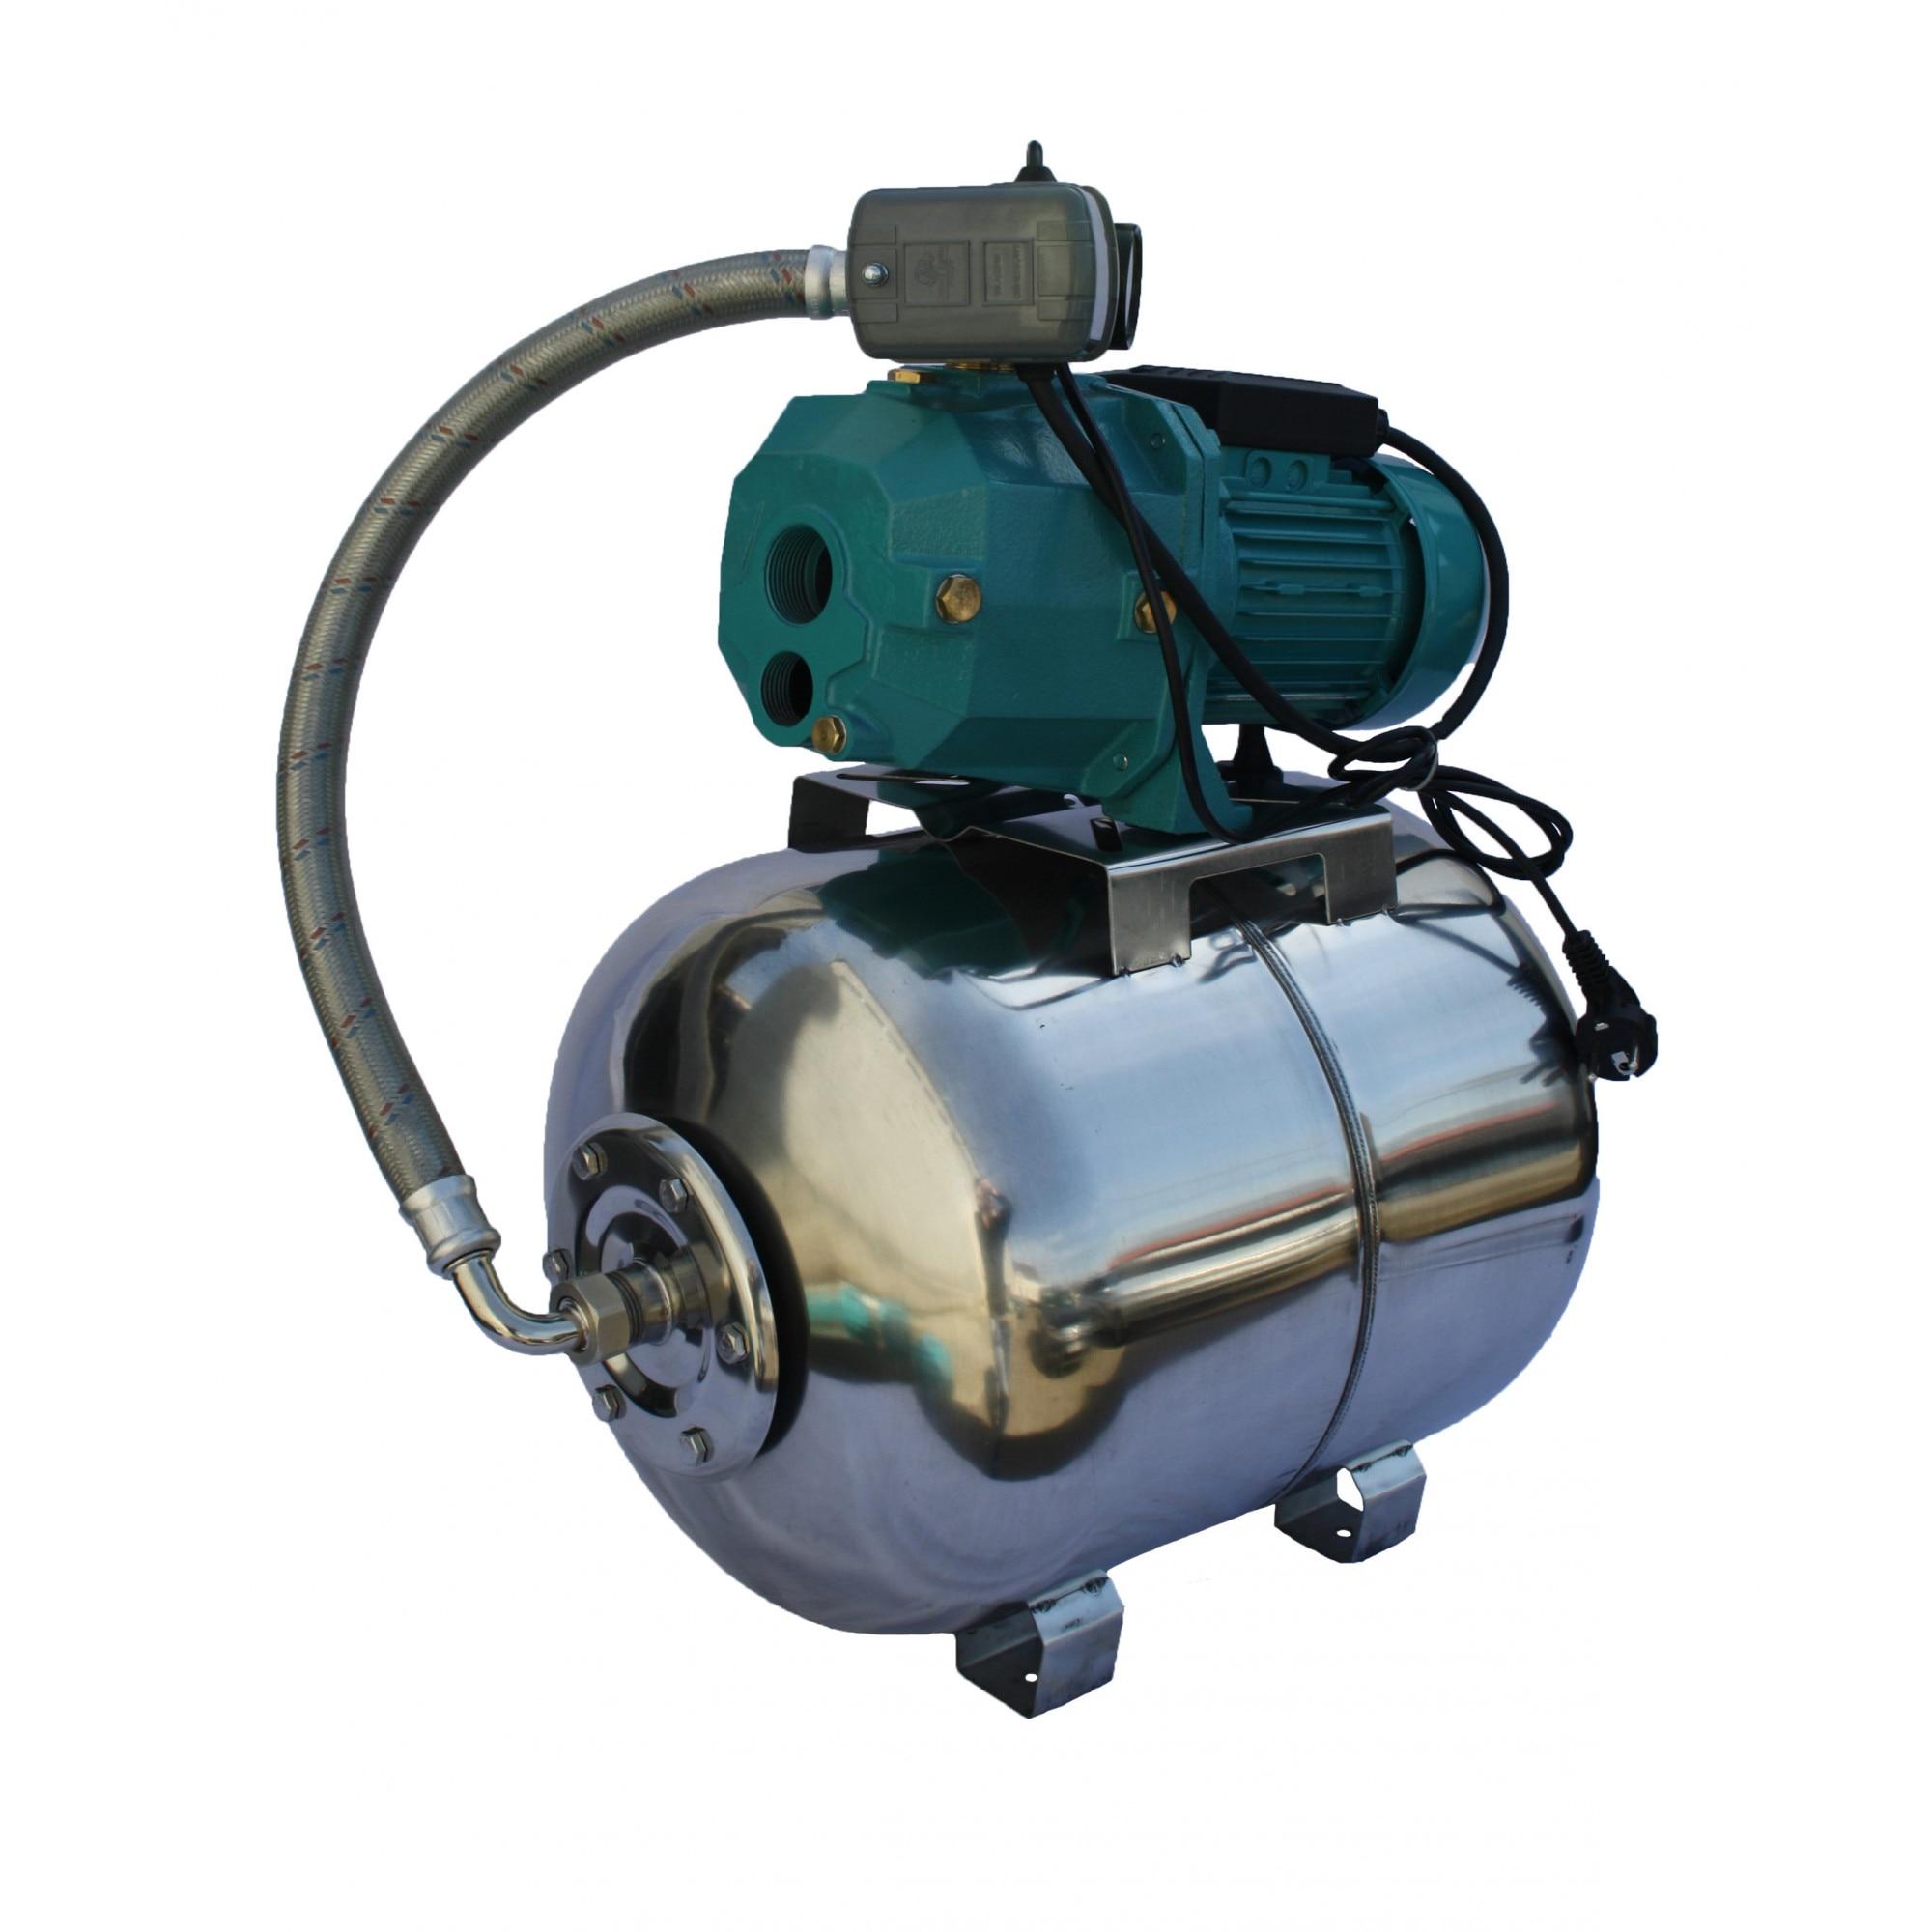 Fotografie Hidrofor apa curata de mare adancime cu ejector Omnigena OM5003/50I, 750 W, 50 l capacitate vas expansiune, 42 l/min debit maxim, 38 m inaltime refulare, 23 m adancime absorbtie